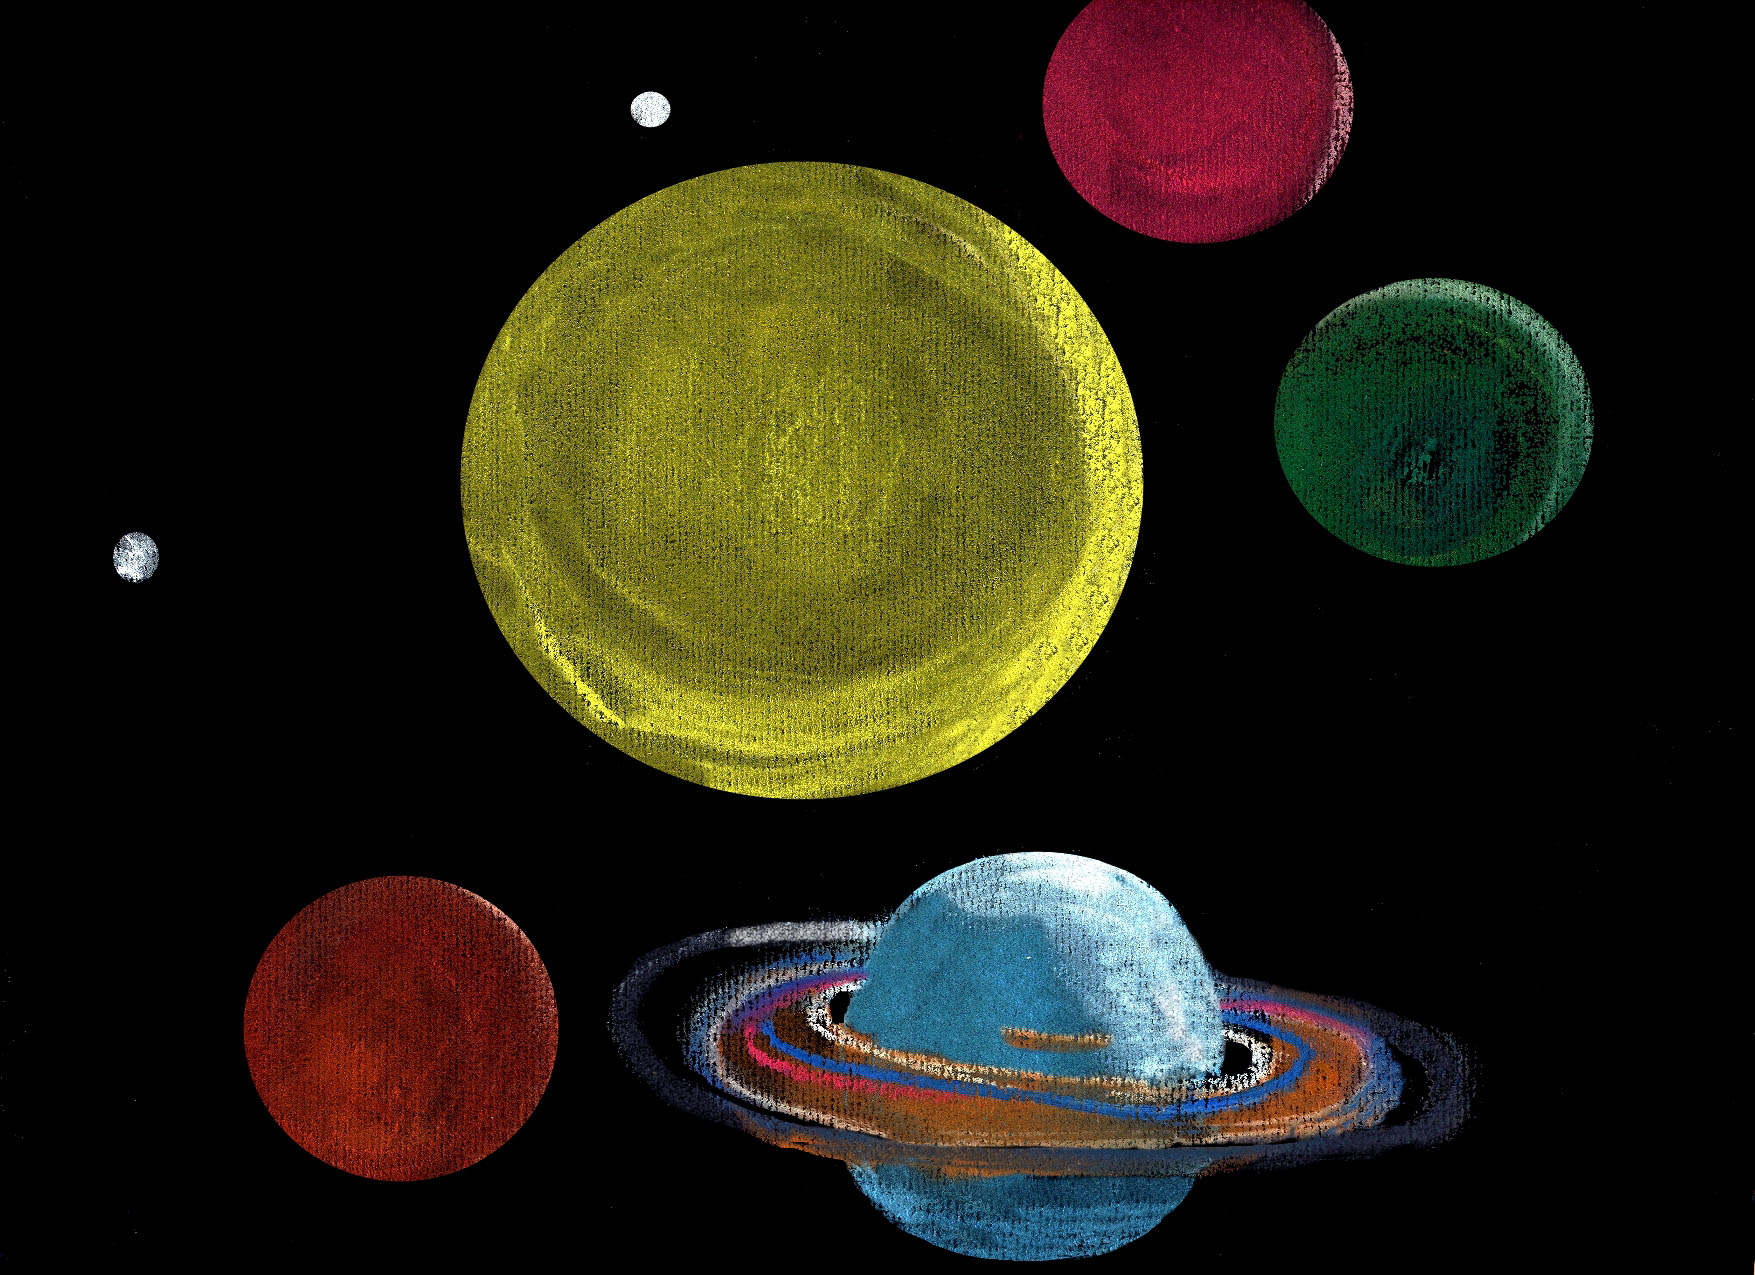 3500 extrasolar planets - photo #43